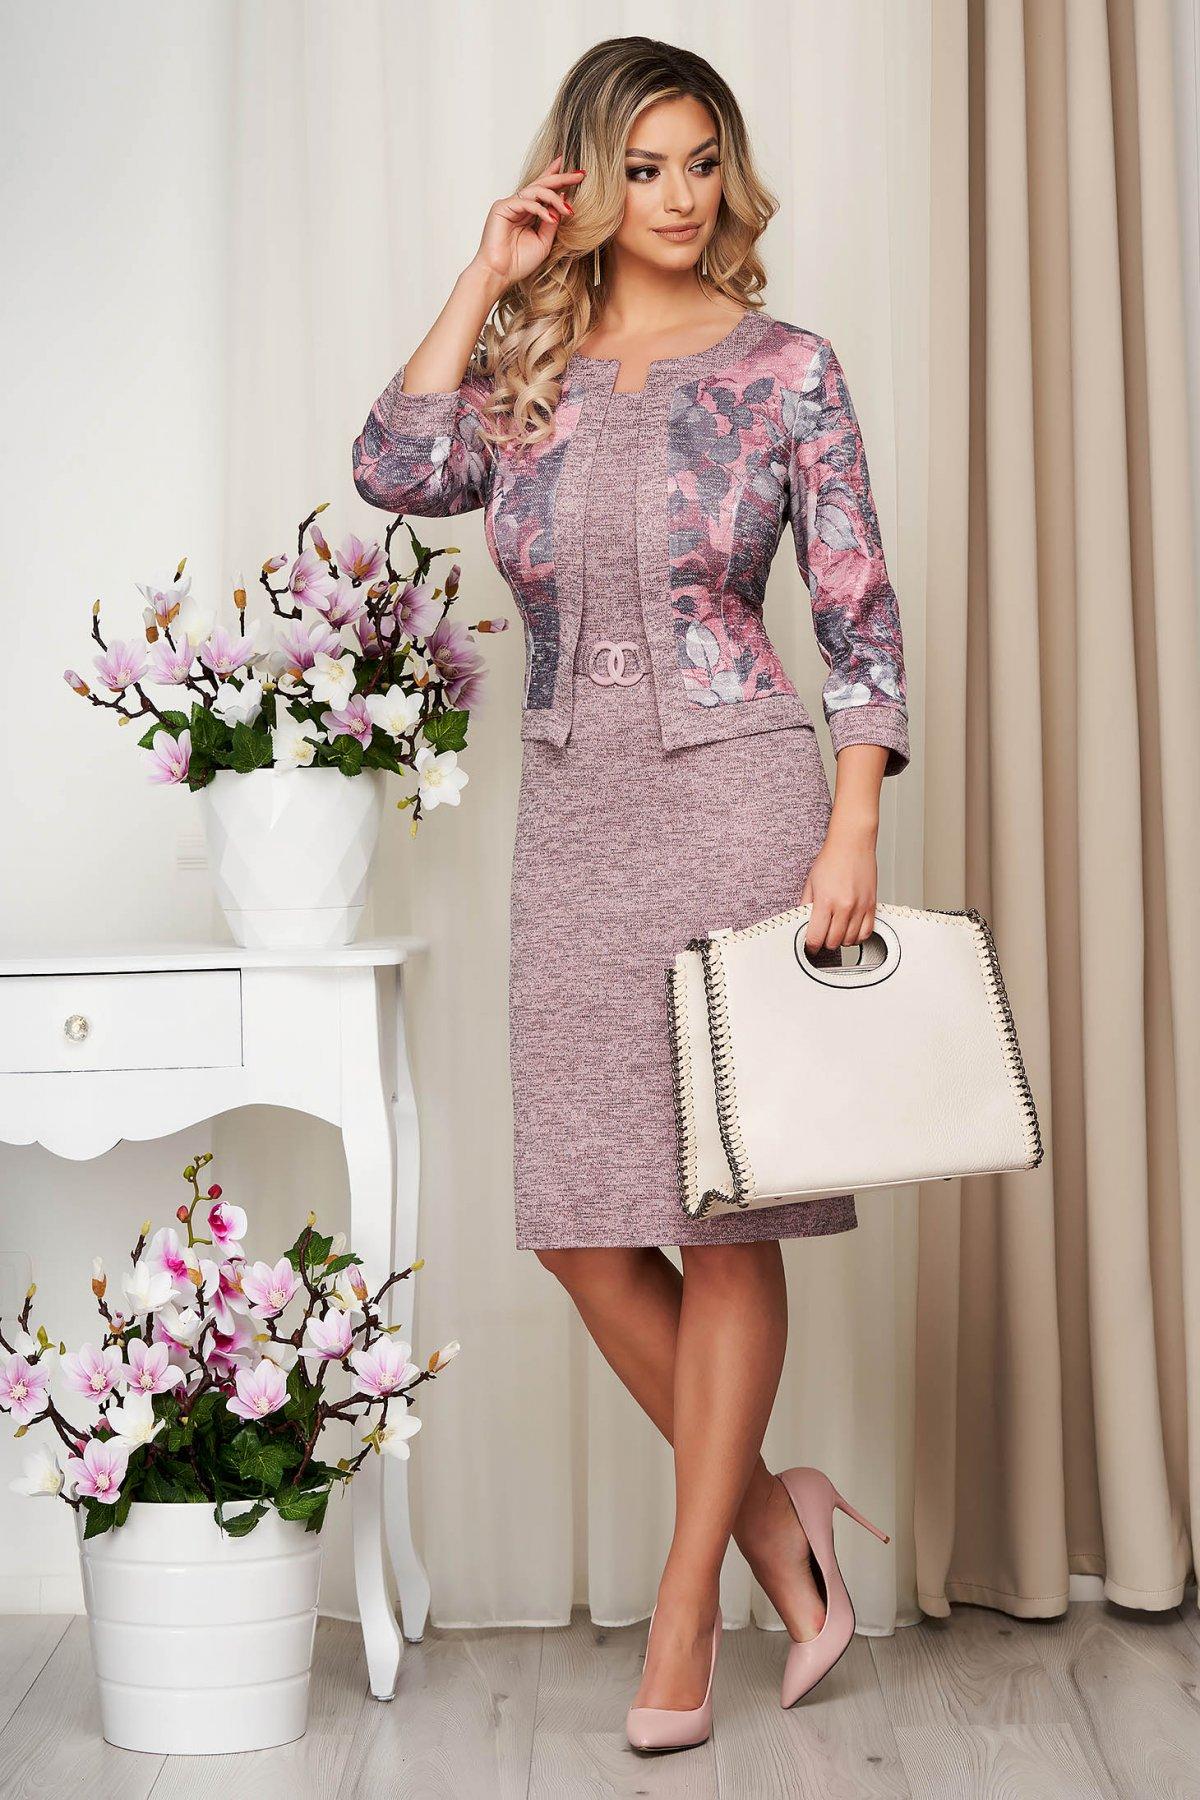 Rochie Lady Pandora Roz Din Material Elastic Tricotata Tip Creion Cu Cardigan Fals